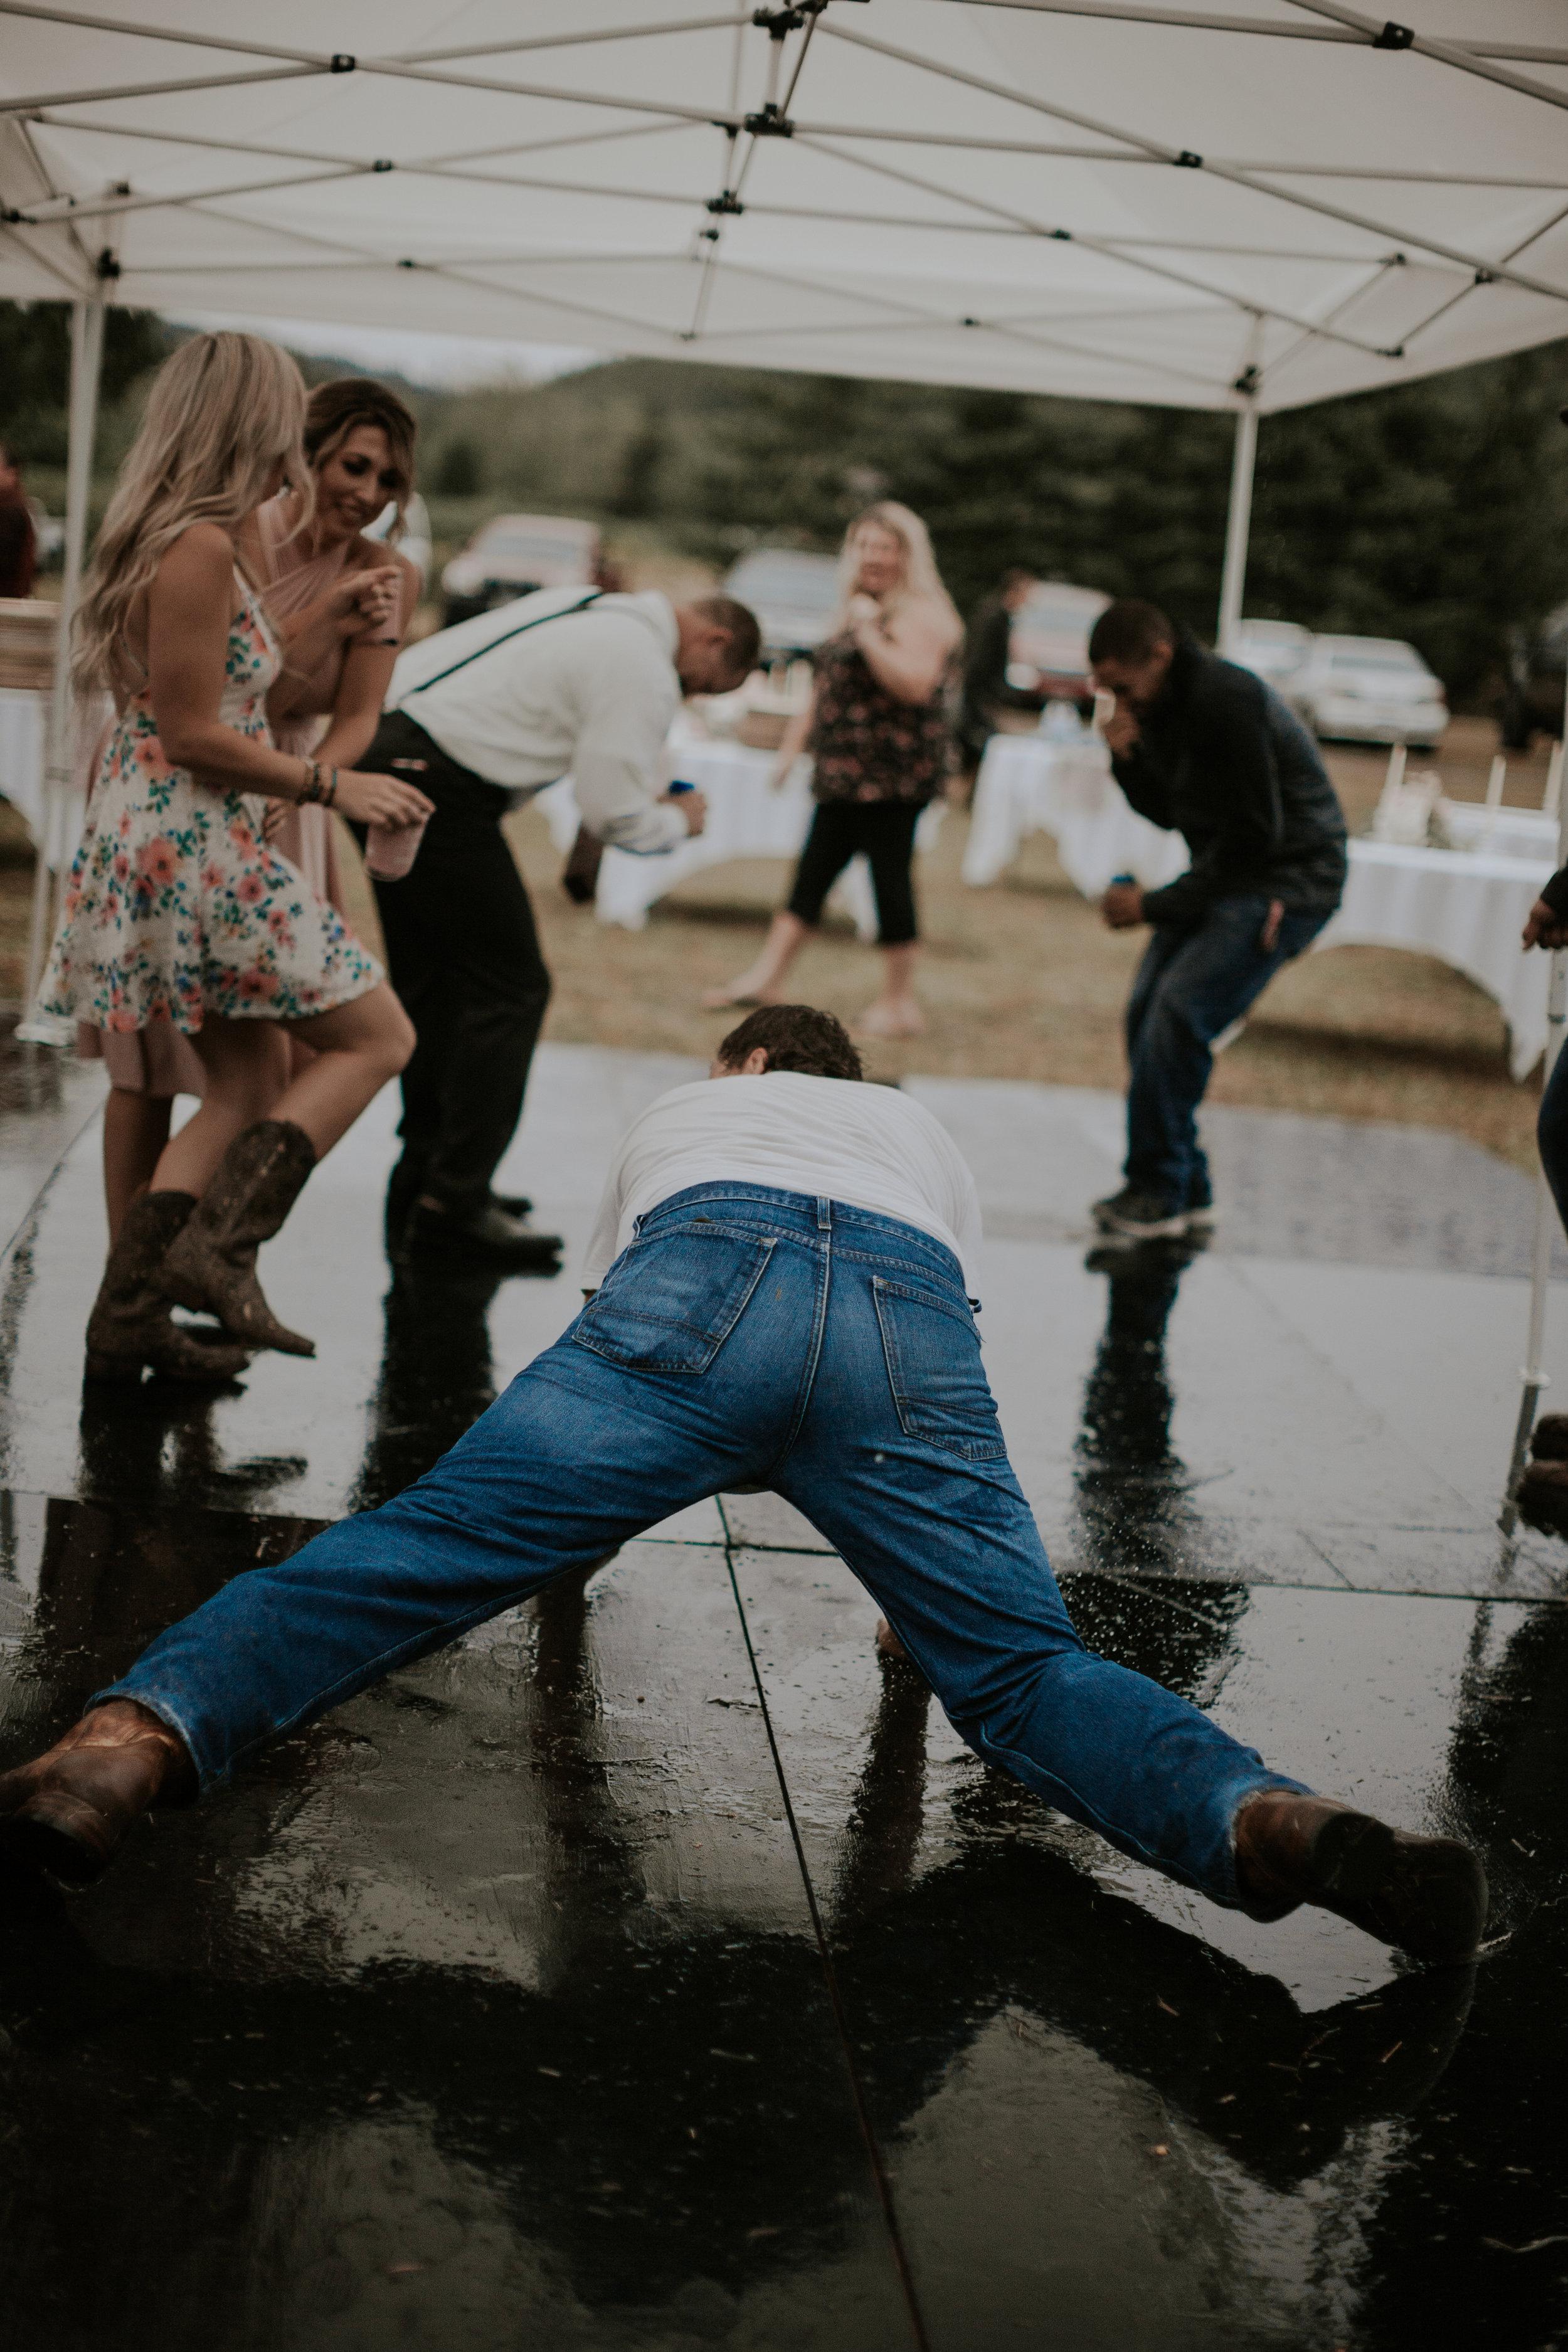 Olympic-Peninsula-Wedding-Photographer-PNW-Forks-Port-Angeles-Kayla-Dawn-Photography-engagement-Olympic-National-Park-247.jpg